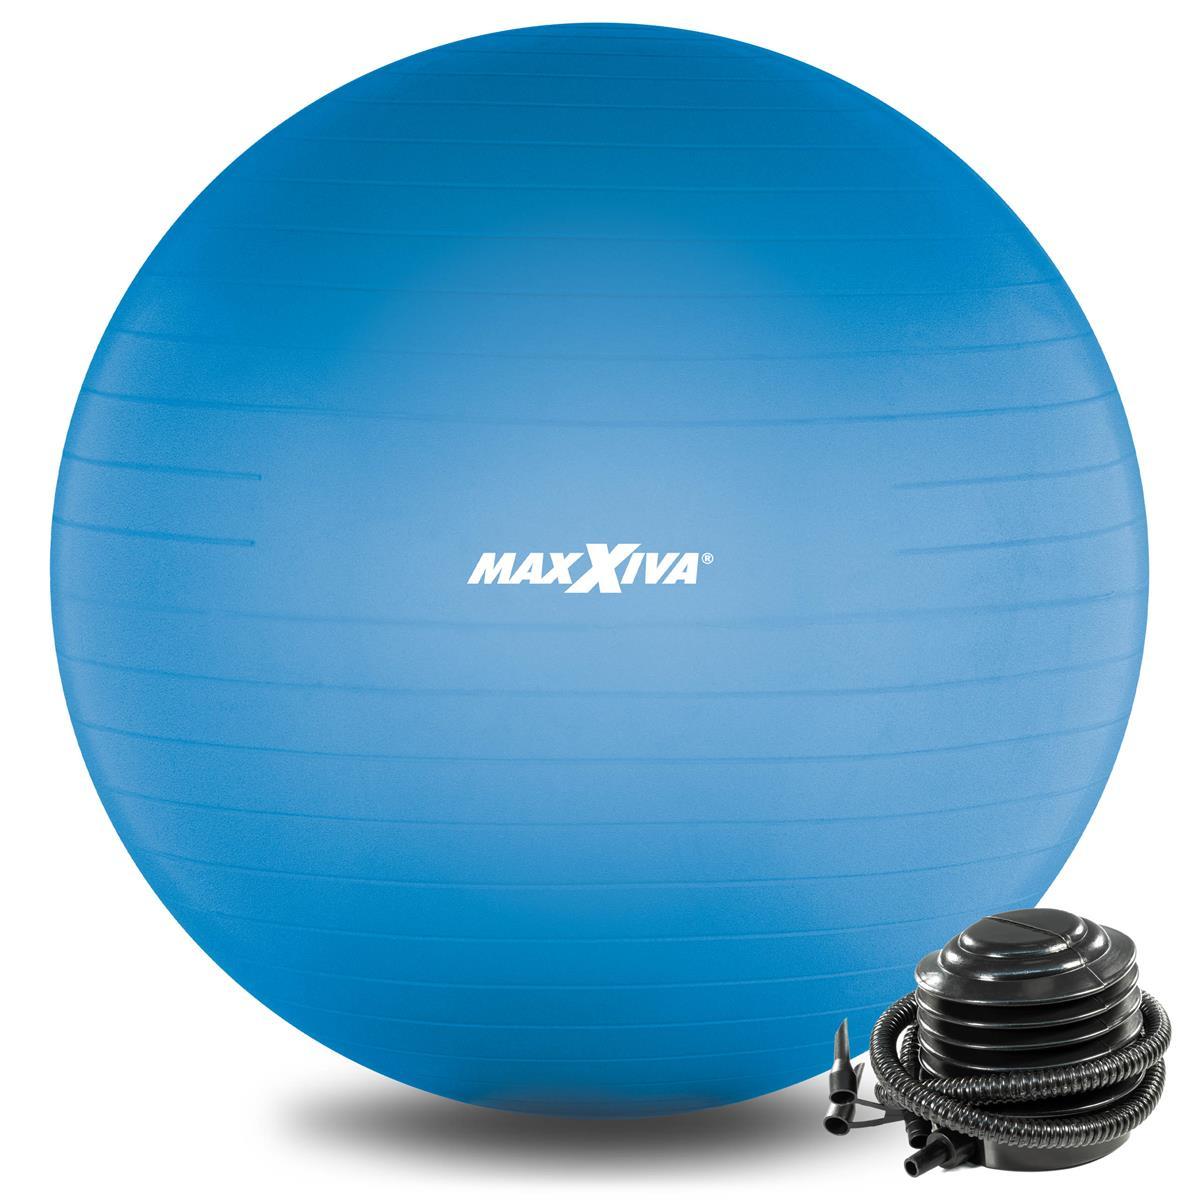 MAXXIVA Gymnastikball Ø 65 cm Blau mit Pumpe Sitzball Fitness Yoga Pilates